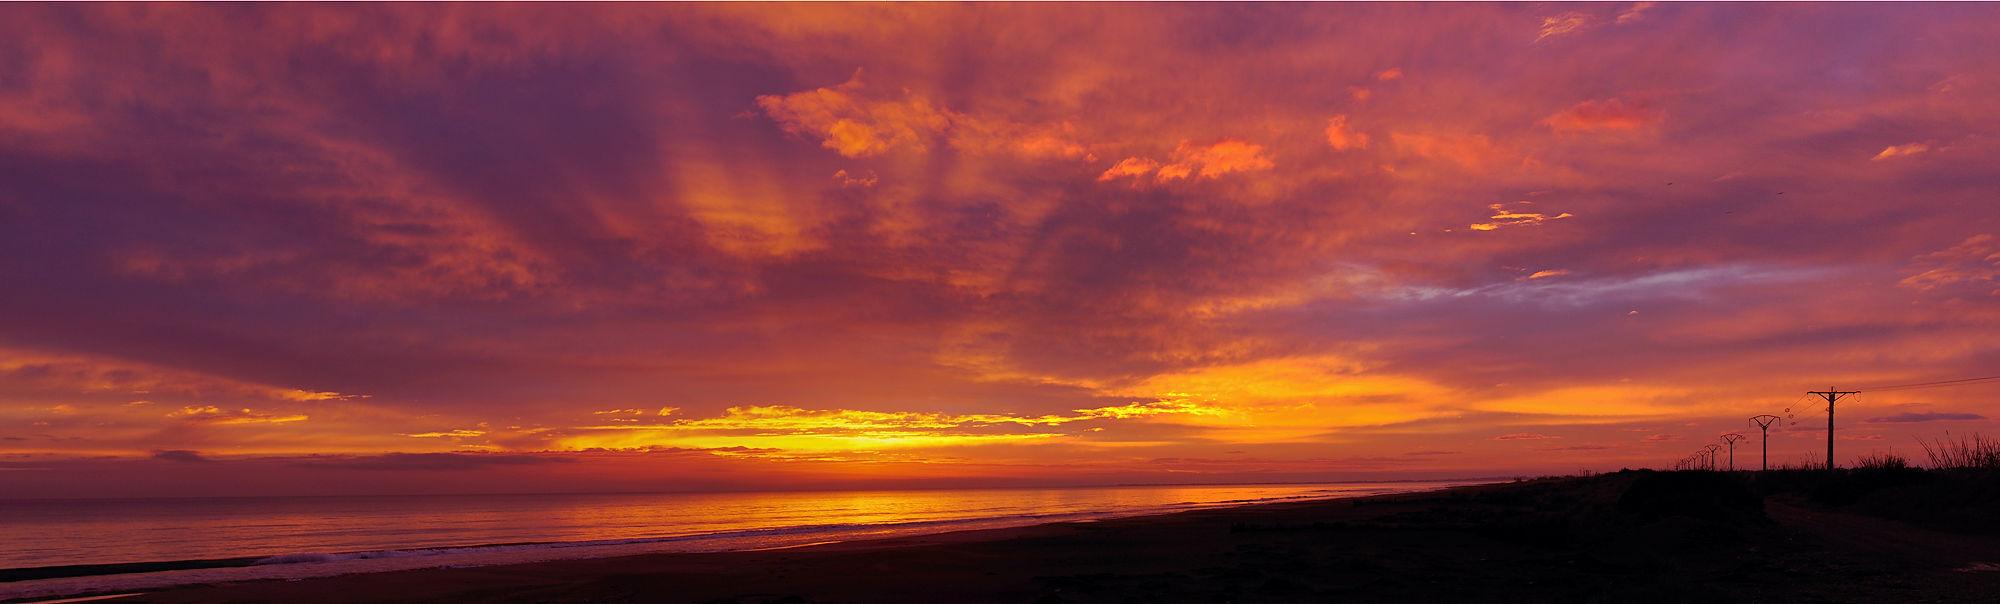 Morgen, heute ~ vor Sonnenaufgang, der Himmel über dem Meer